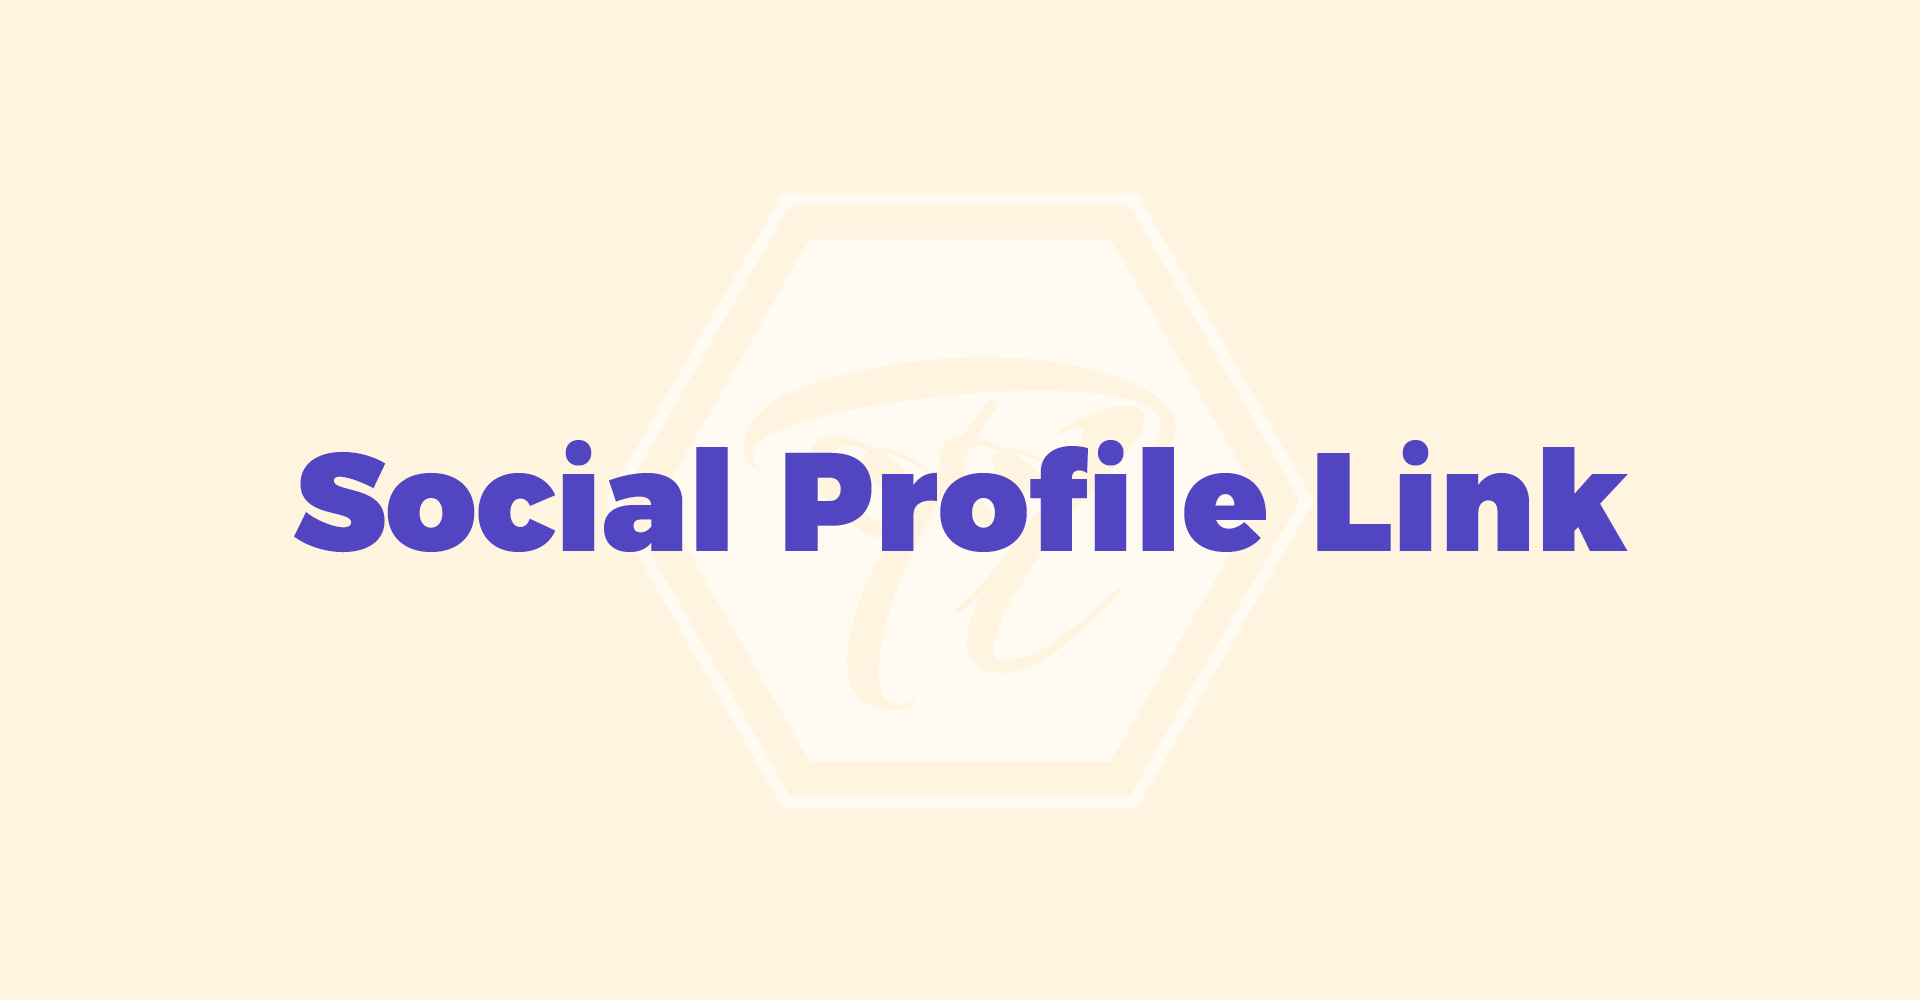 social_profile_link 1 1 2